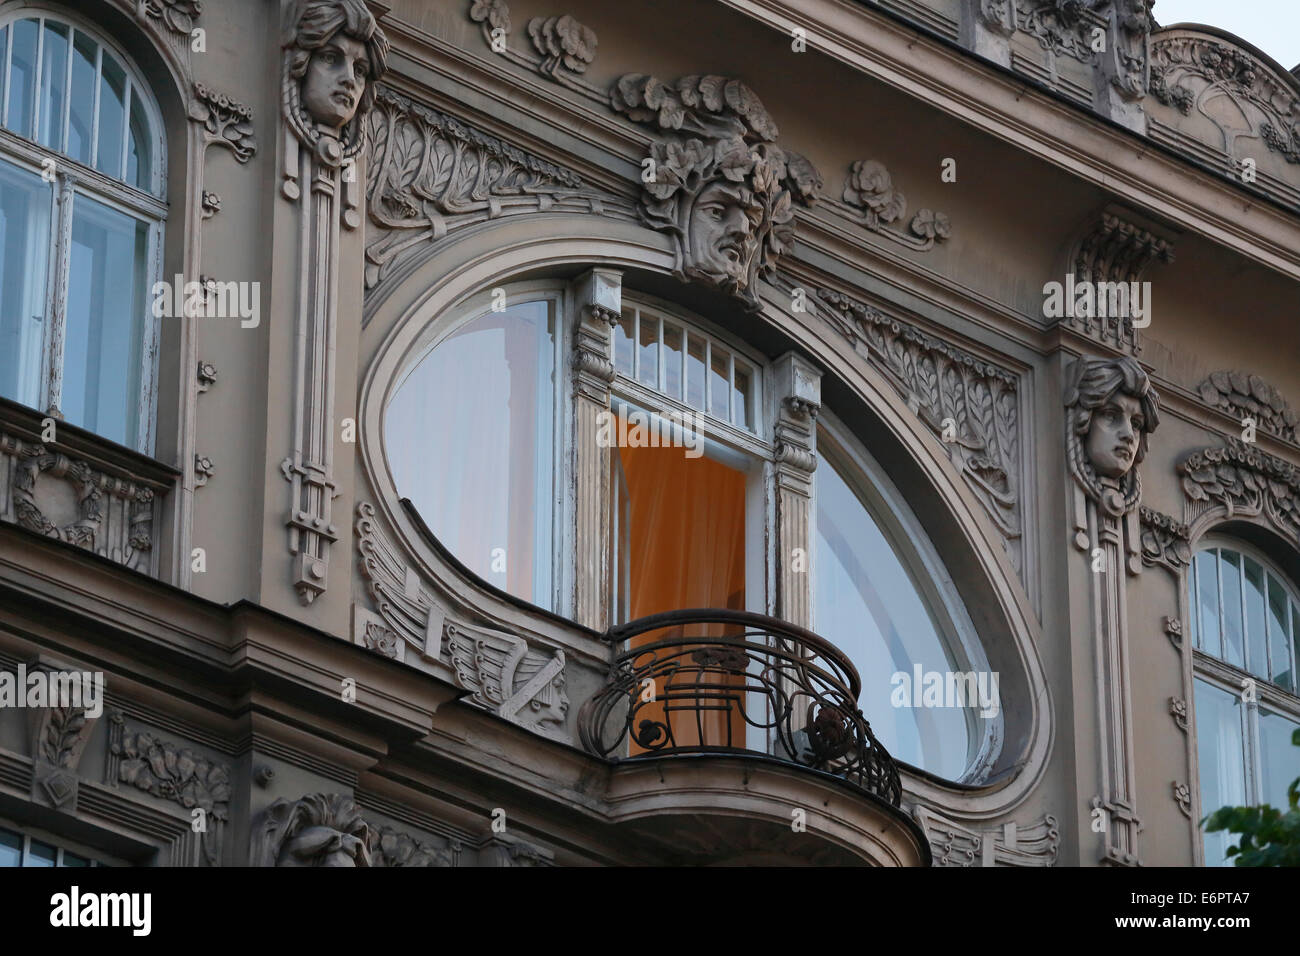 Art Nouveau facade of the house Eliza iela 10a or Elizabeth Street 10a, architects Mikhail Eisenstein and Konstantin - Stock Image